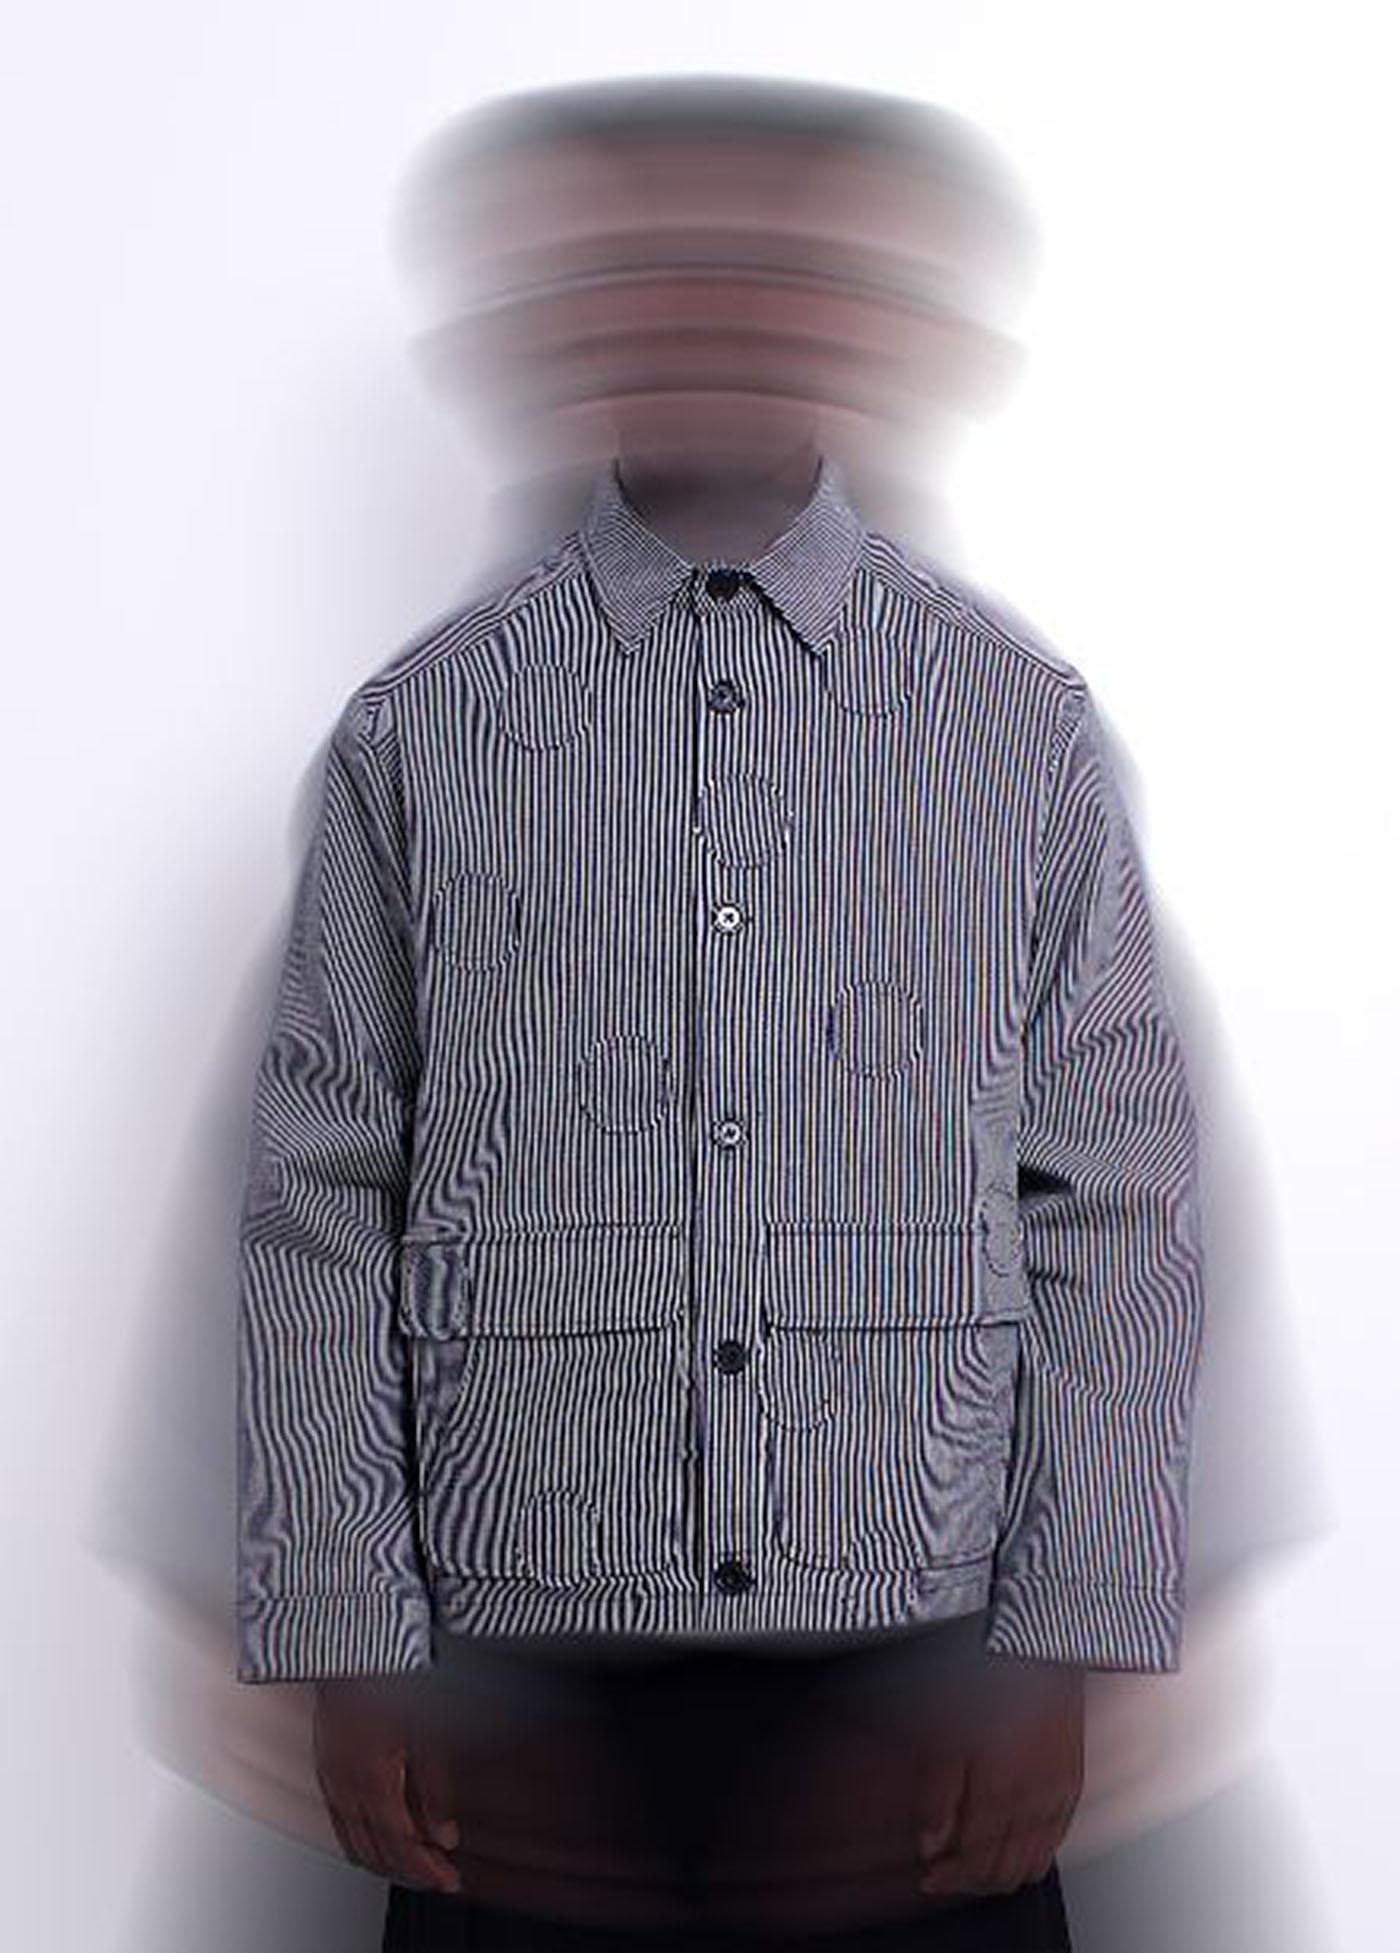 scar-id-alexandra-moura-ss21-casaco-coat-almr-1